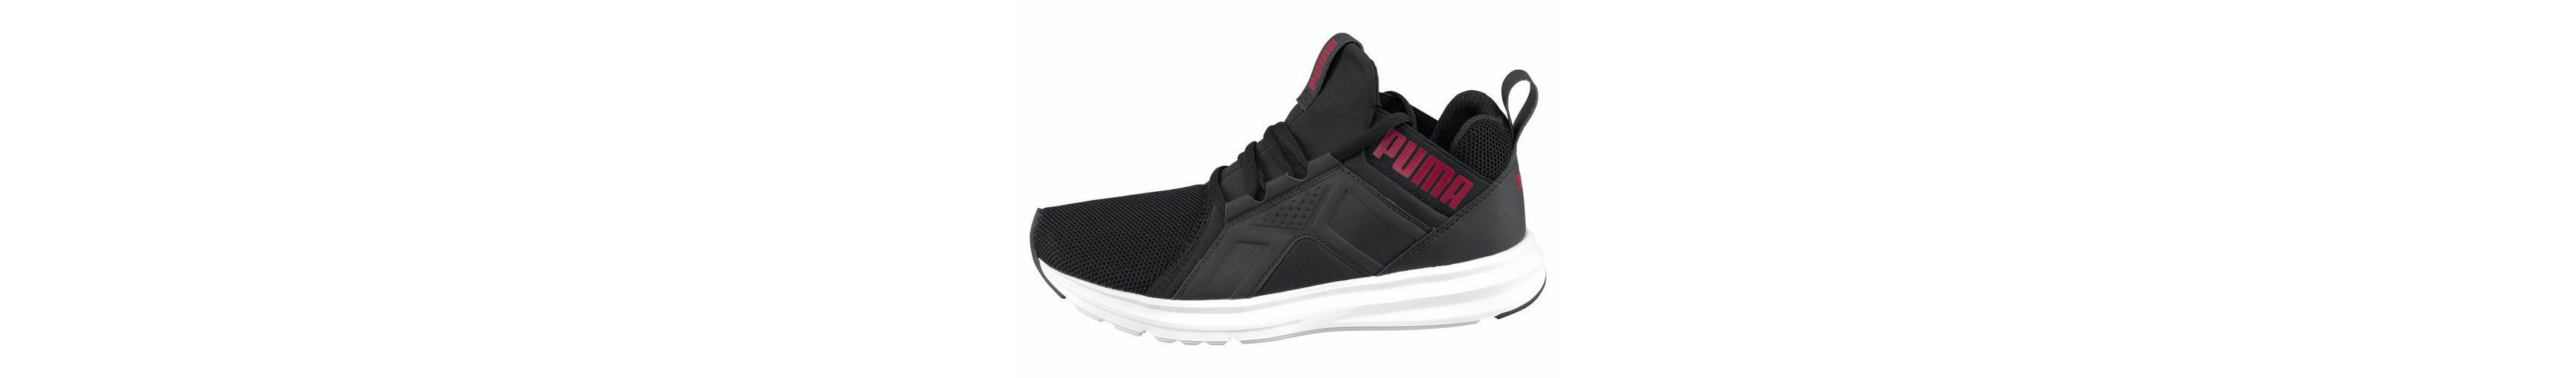 PUMA Enzo Mesh Wn´s Sneaker Rabatt Mit Mastercard S1aouCT